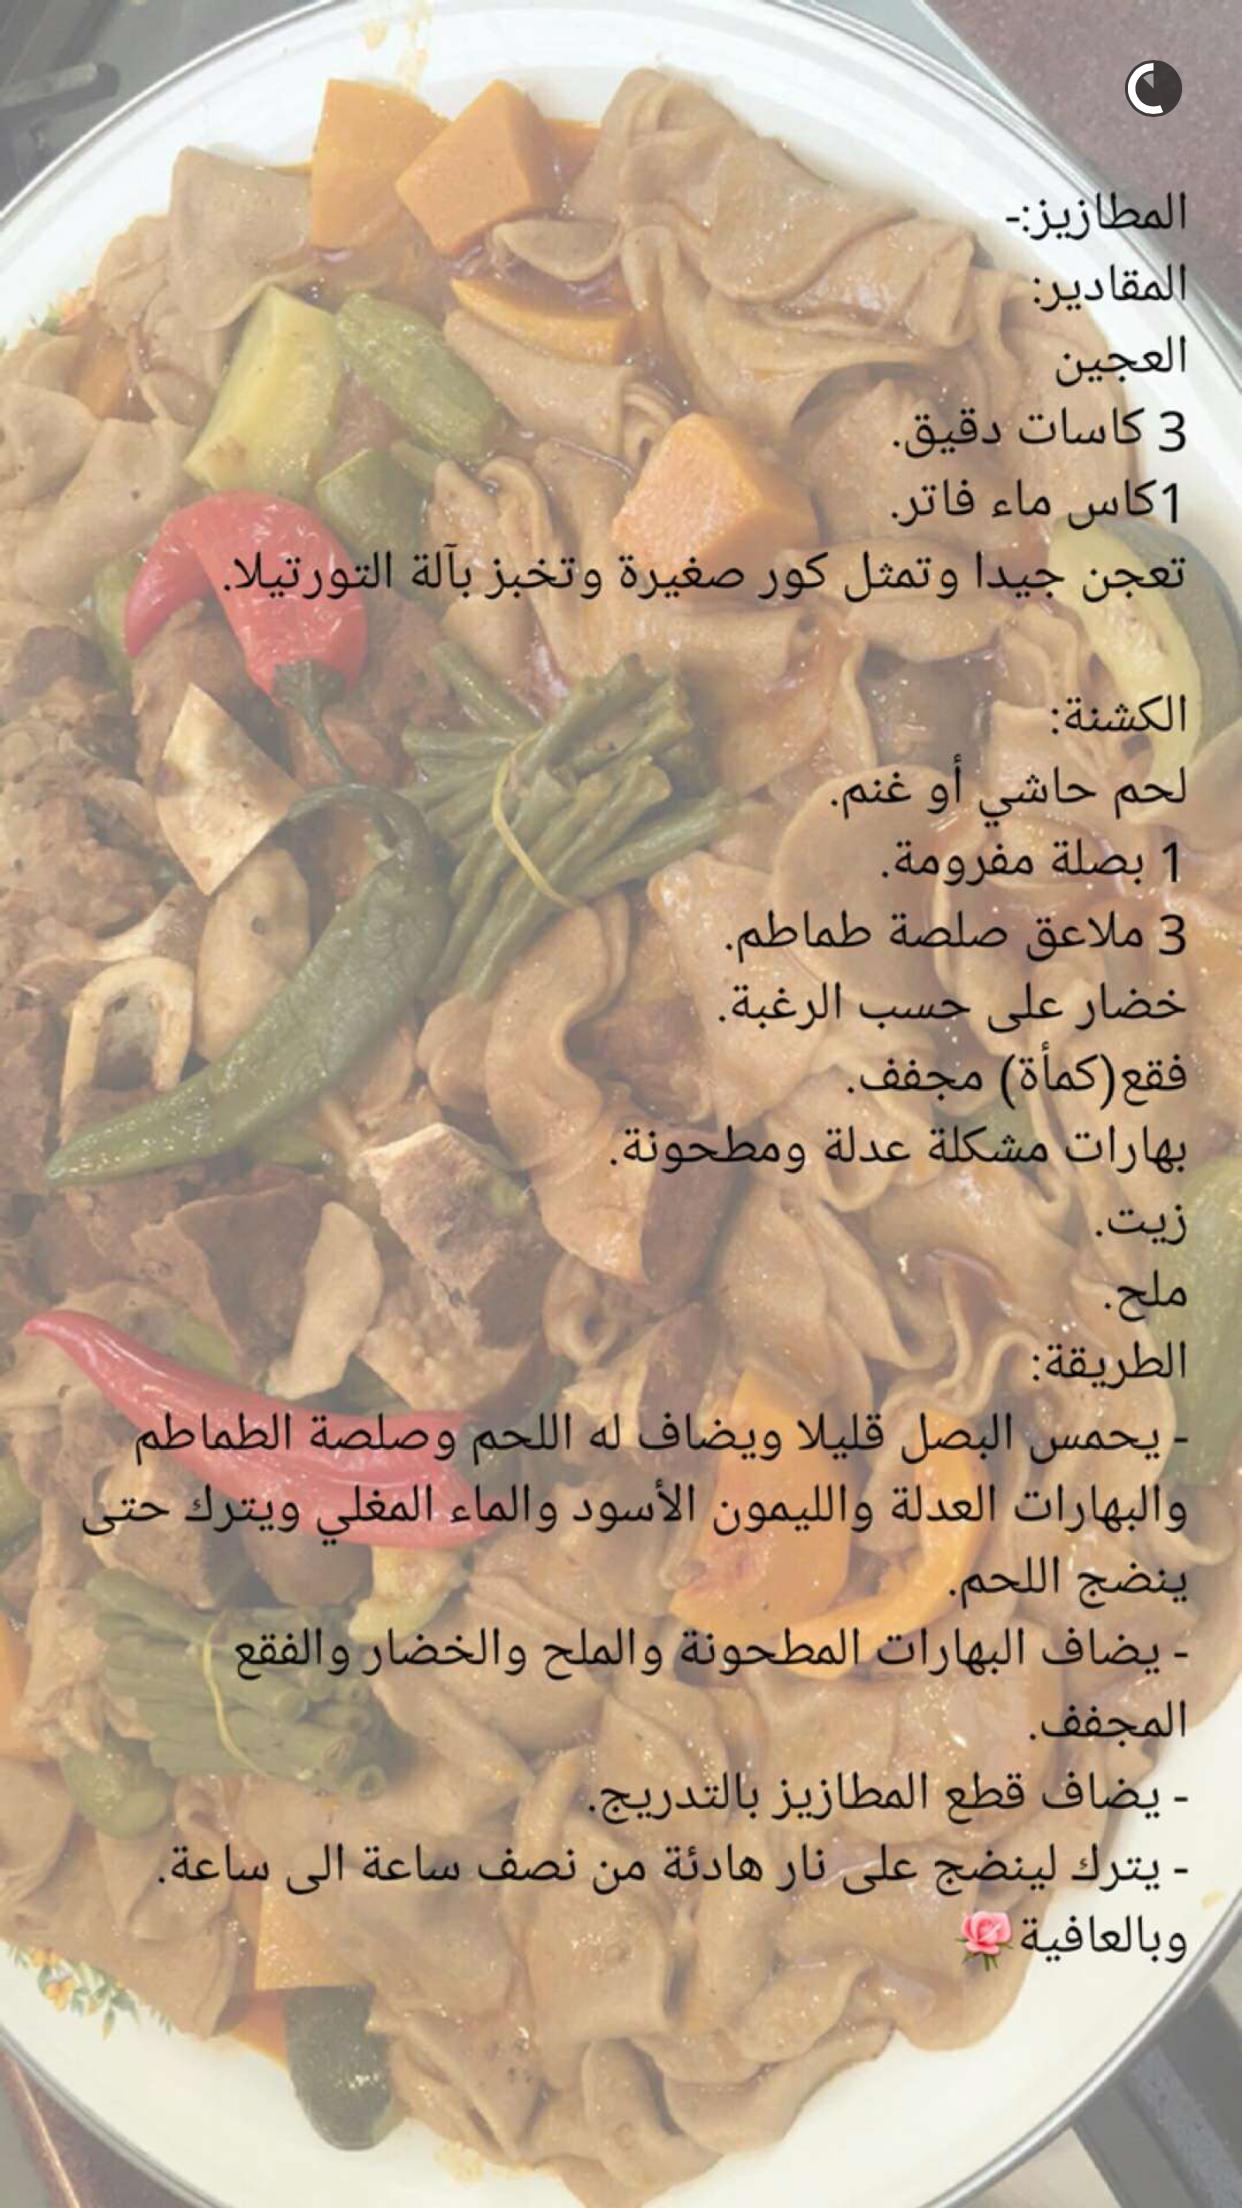 Pin By Do On مرقوق مطازيز مصابيب Arabian Food Cooking Arabic Food